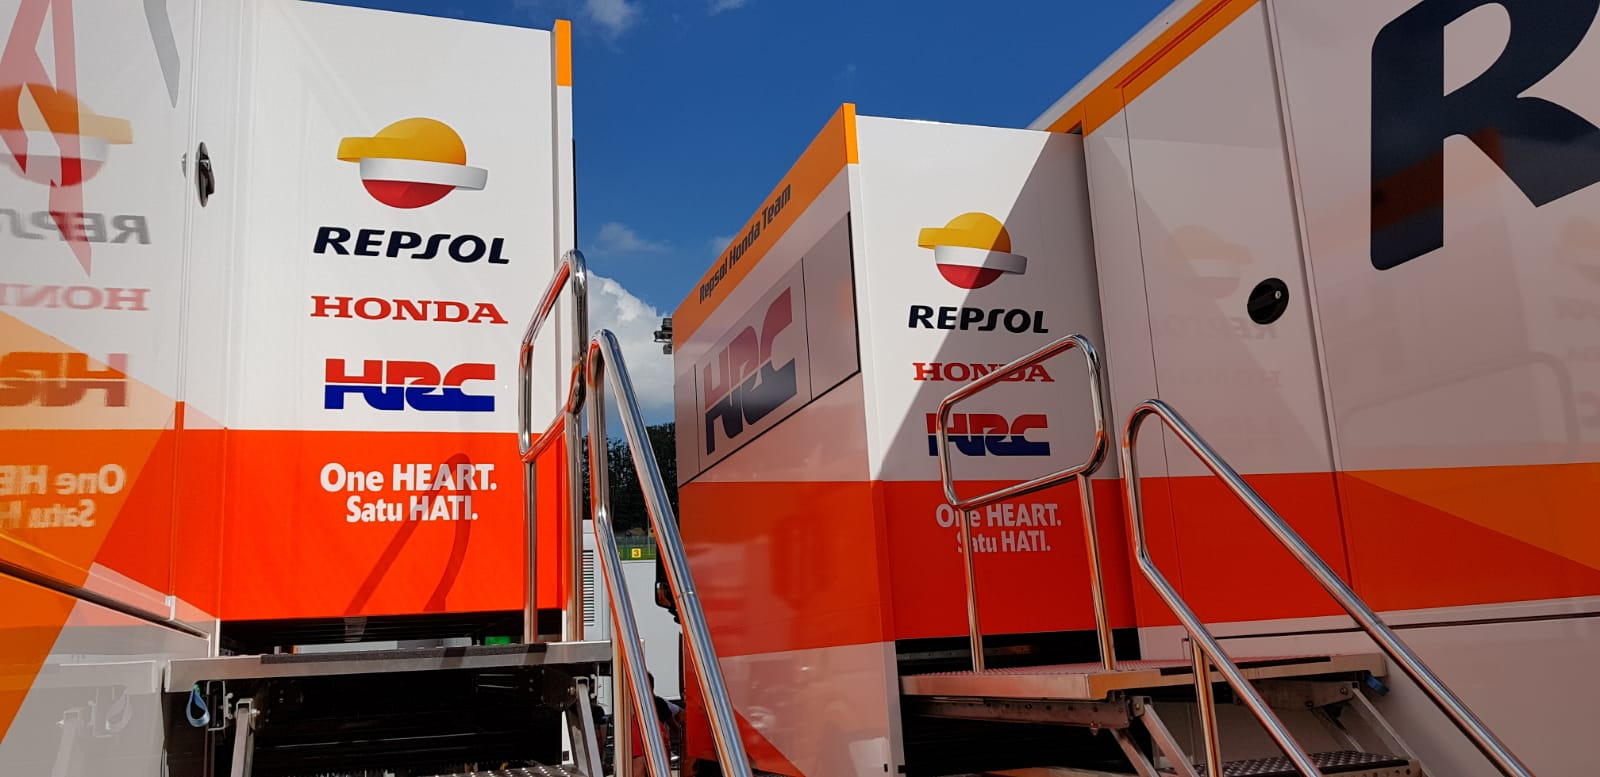 Motorhomes Repsol Honda